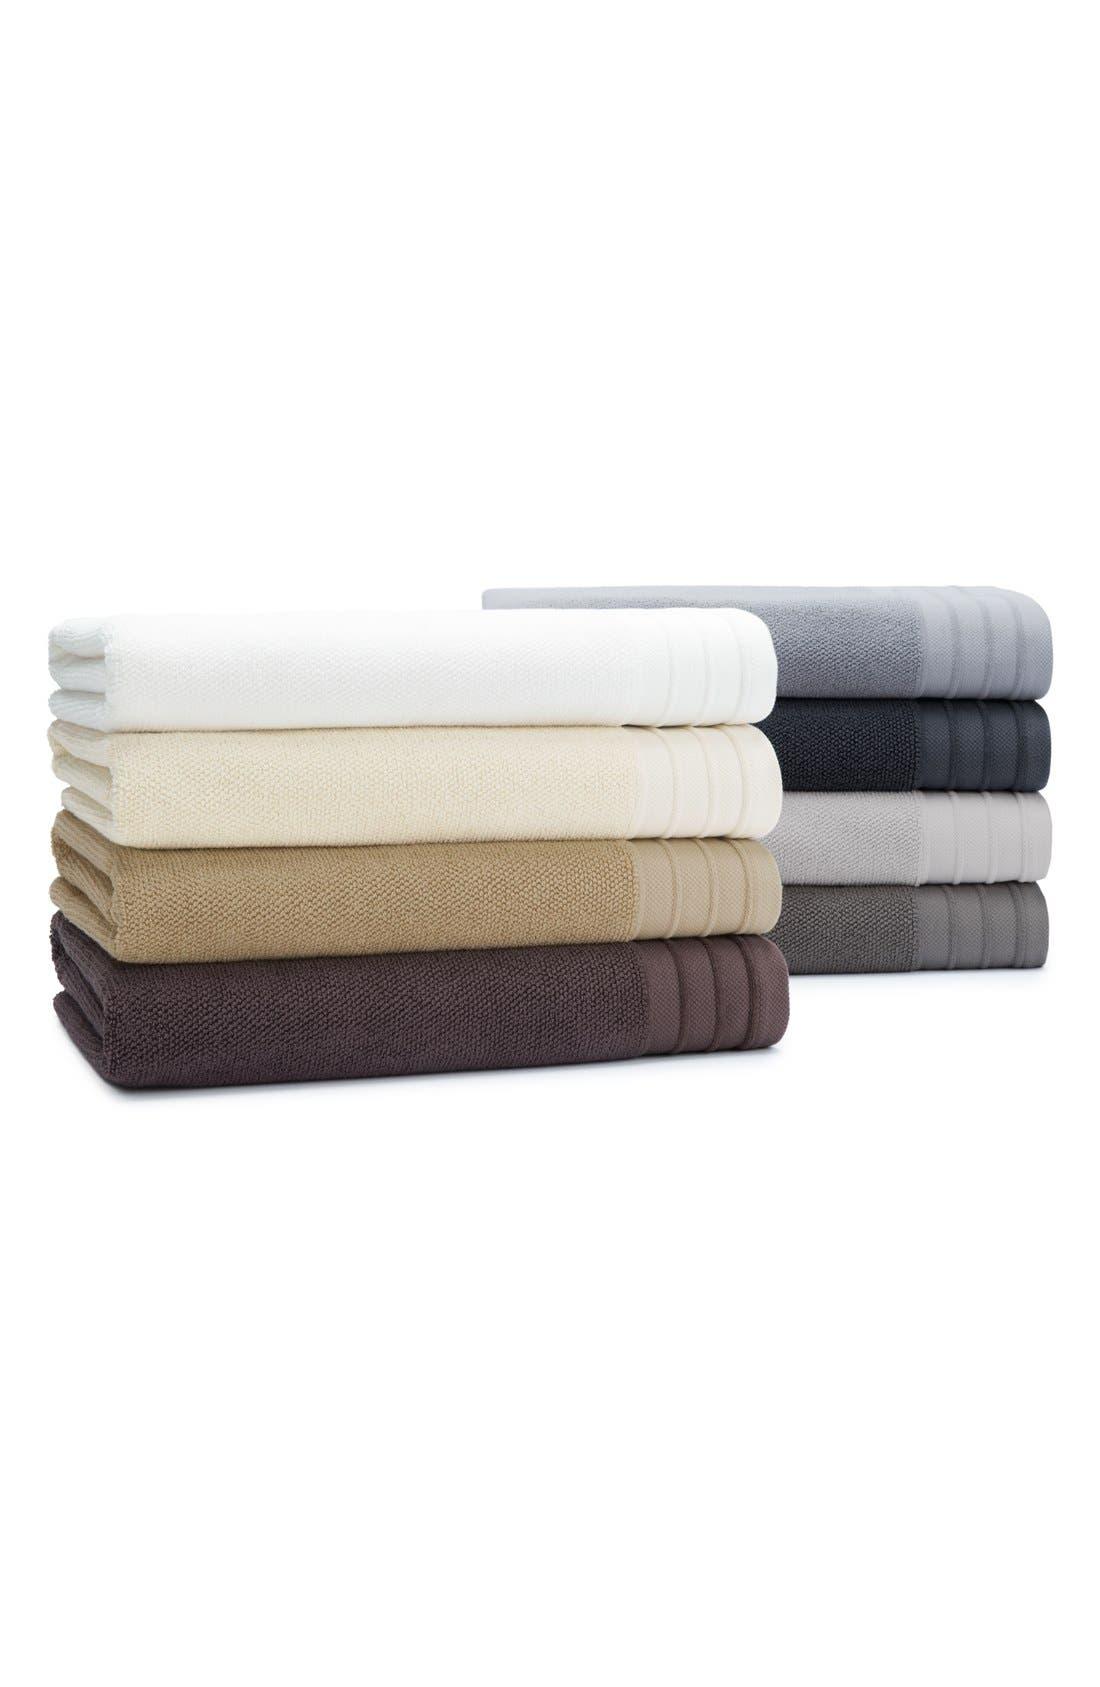 Classic Luxe Cotton Bath Sheet,                             Alternate thumbnail 4, color,                             GRANITE